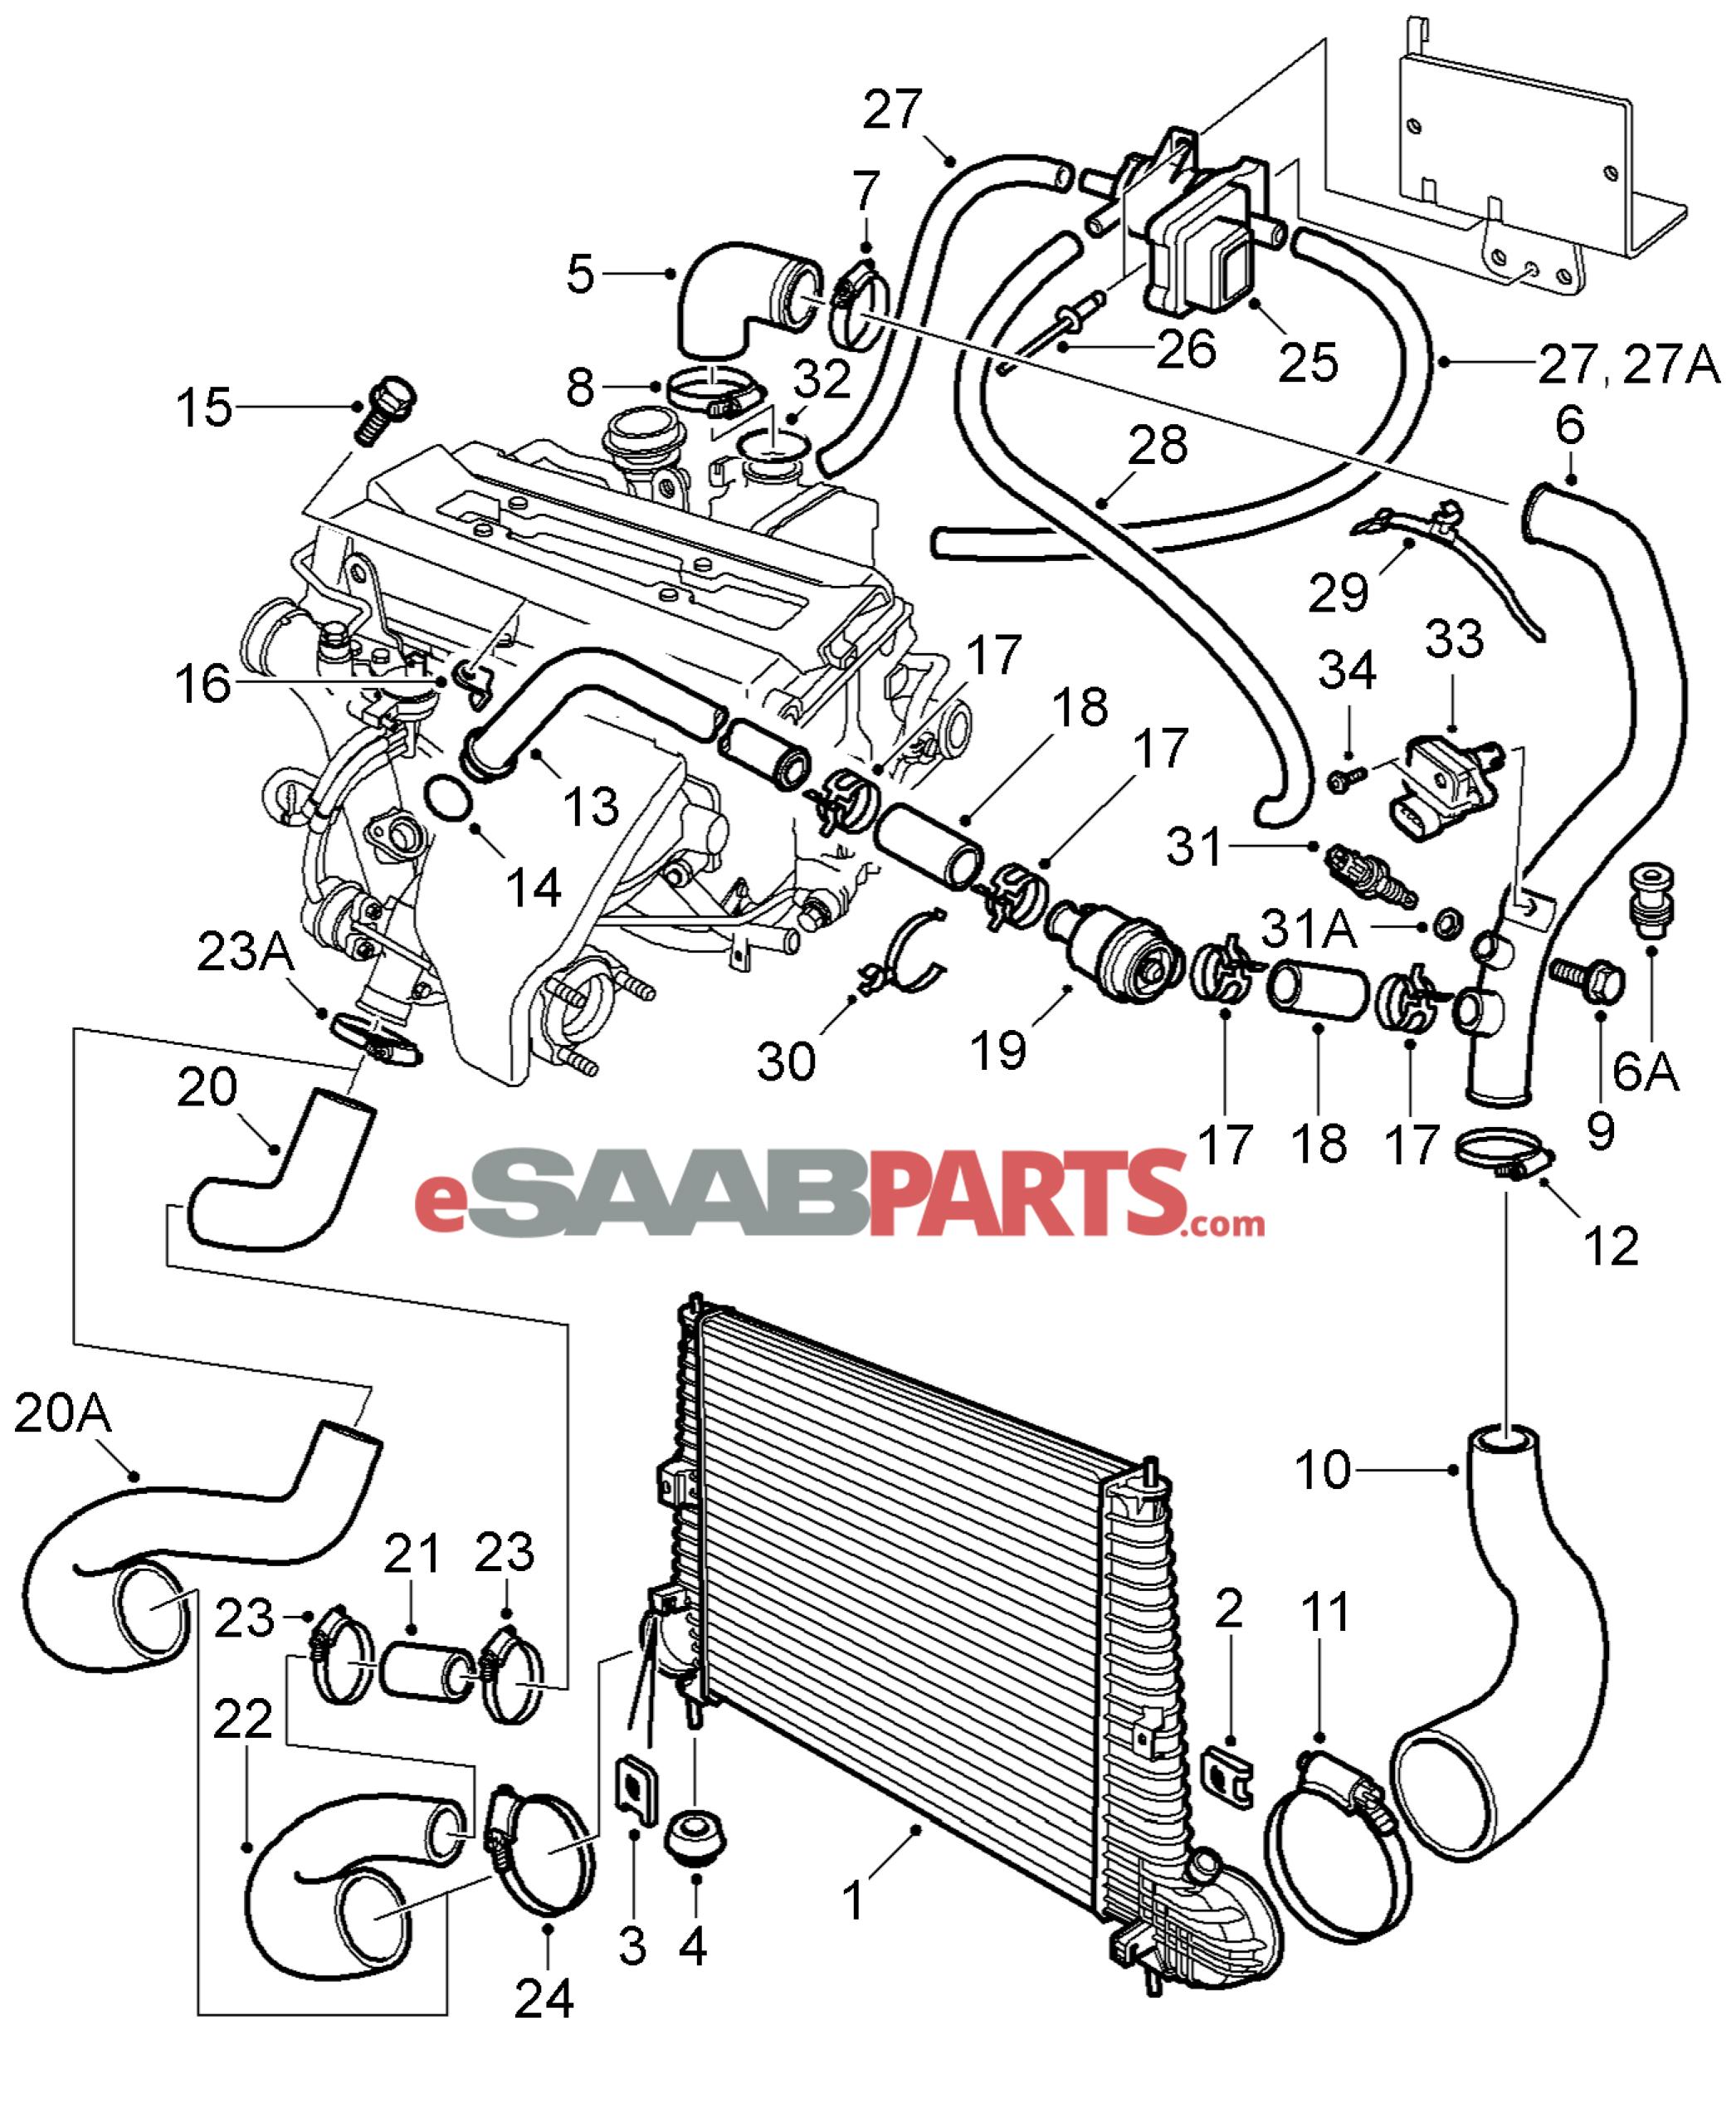 Awe Inspiring Saab 900 Motor Diagram 3 8 Tramitesyconsultas Co Wiring Cloud Licukosporaidewilluminateatxorg